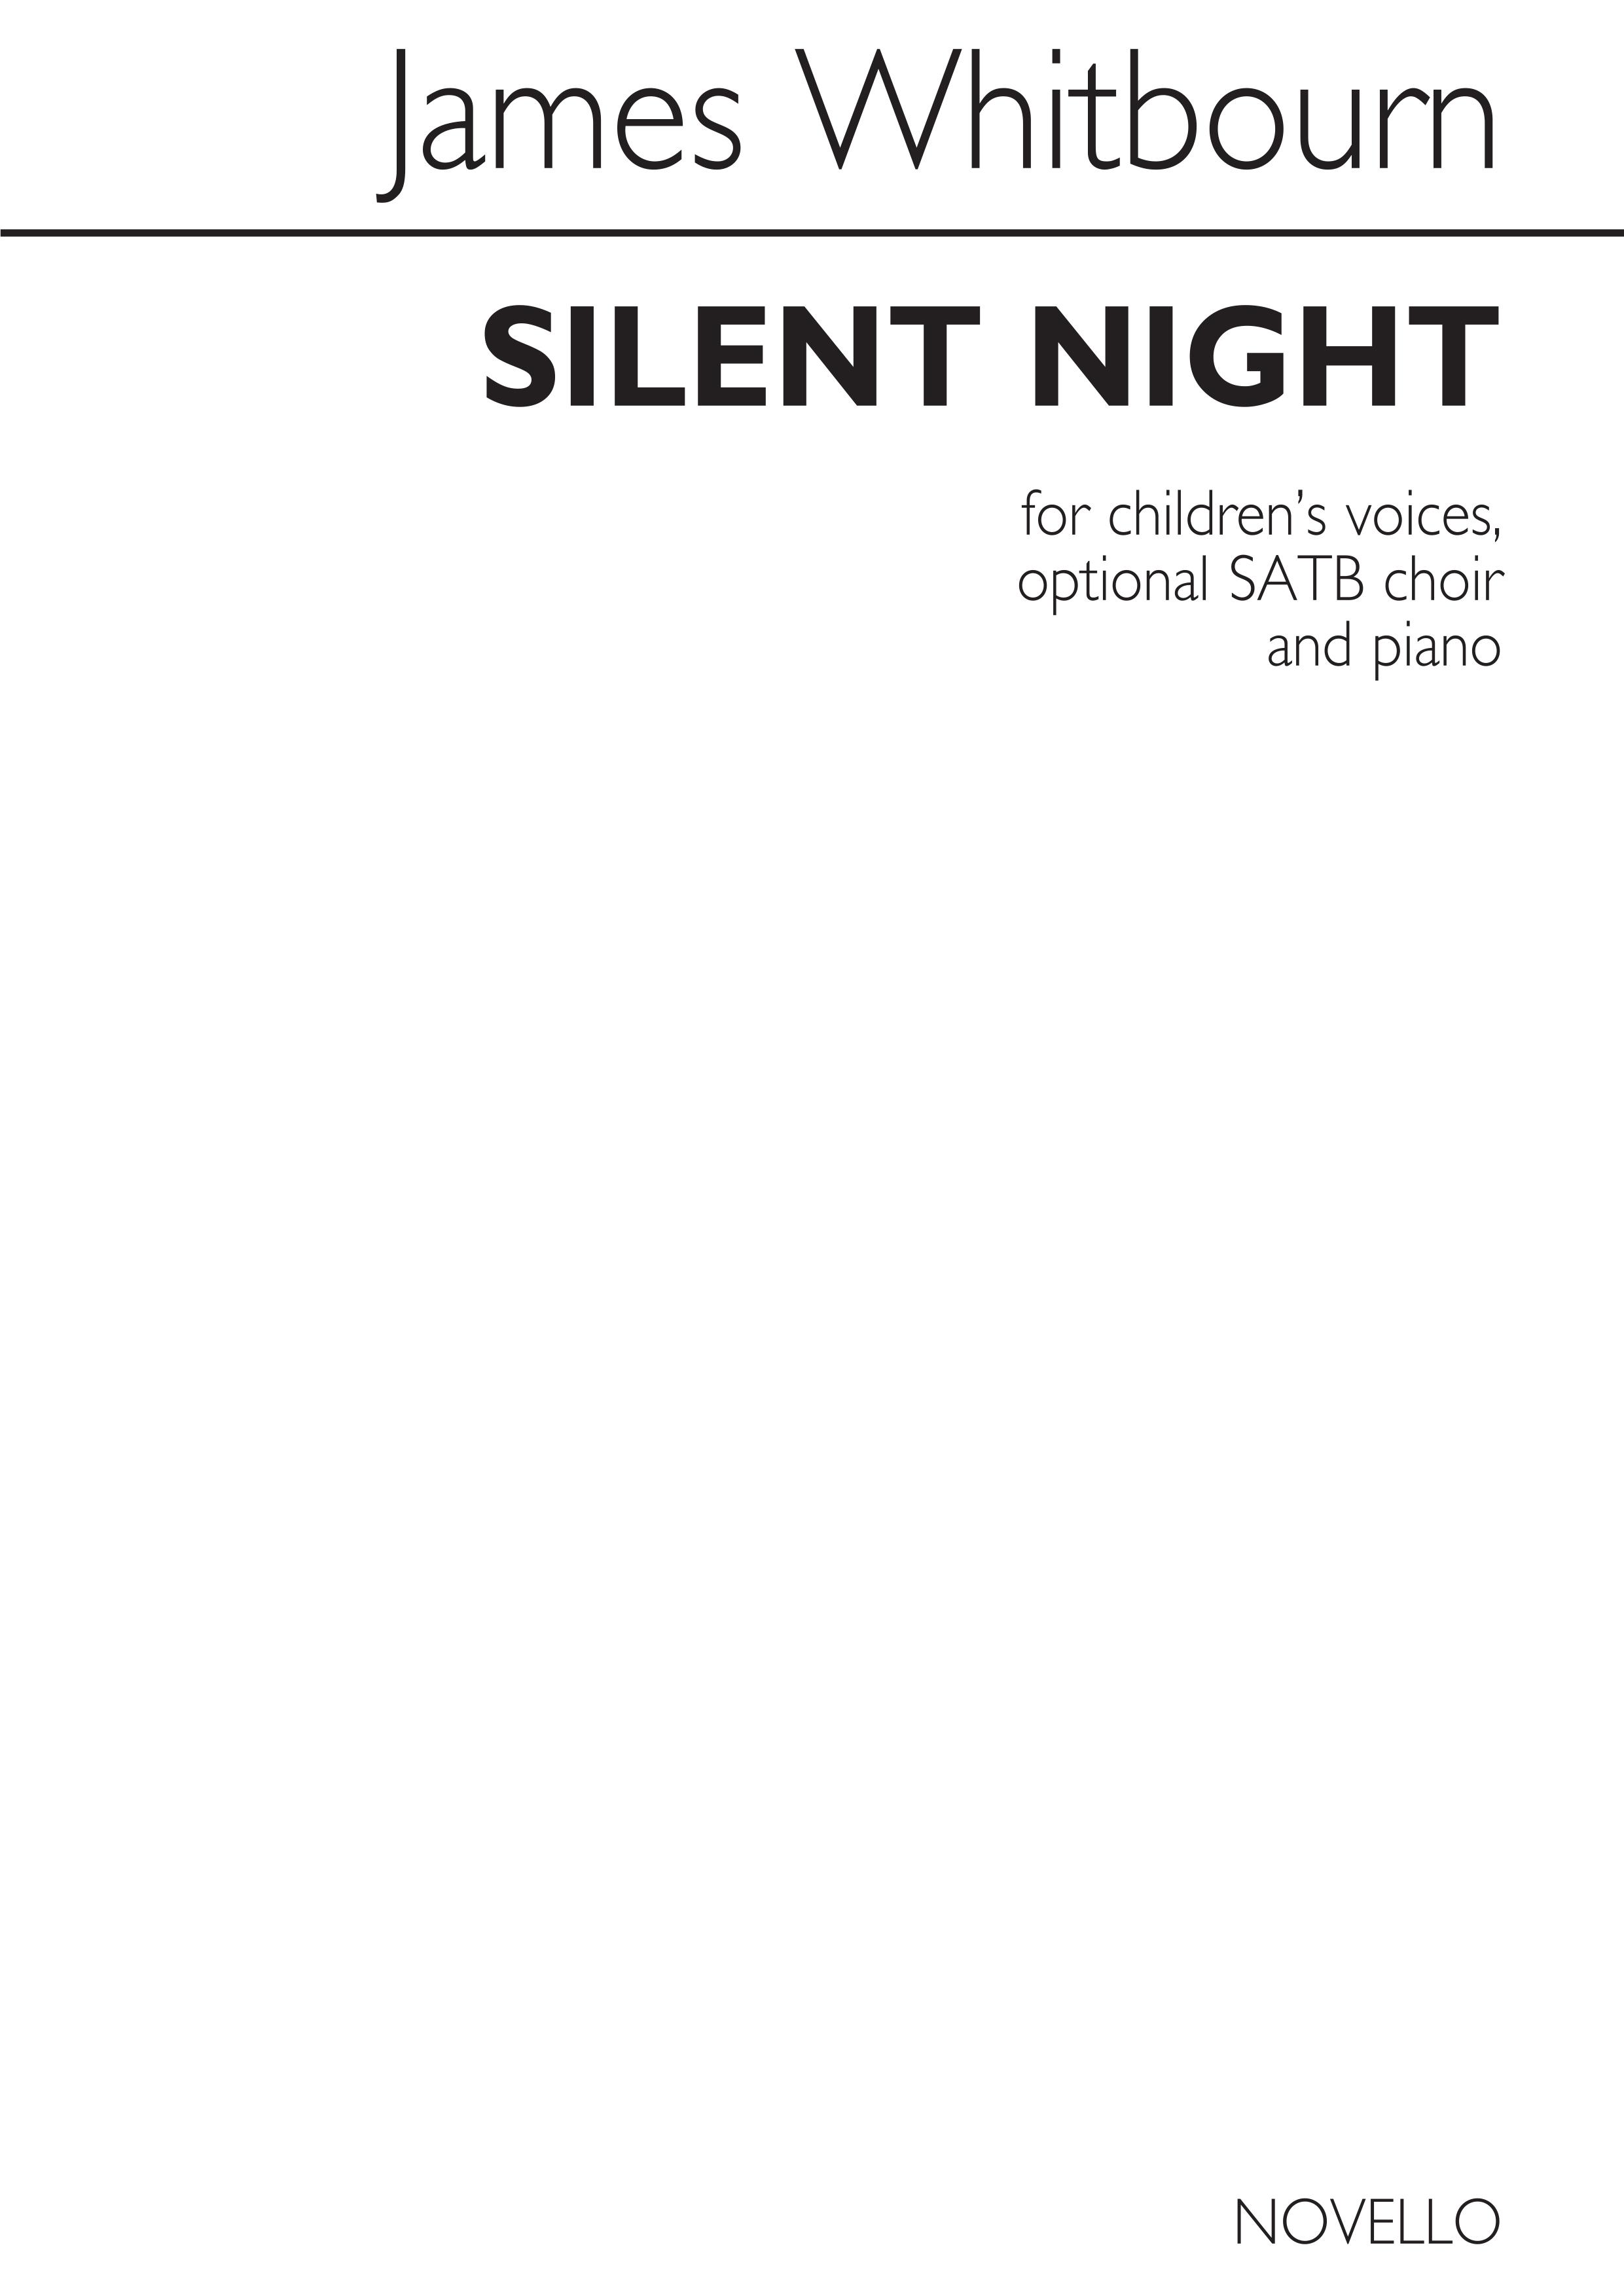 James Whitbourn: Silent Night: SATB: Vocal Score